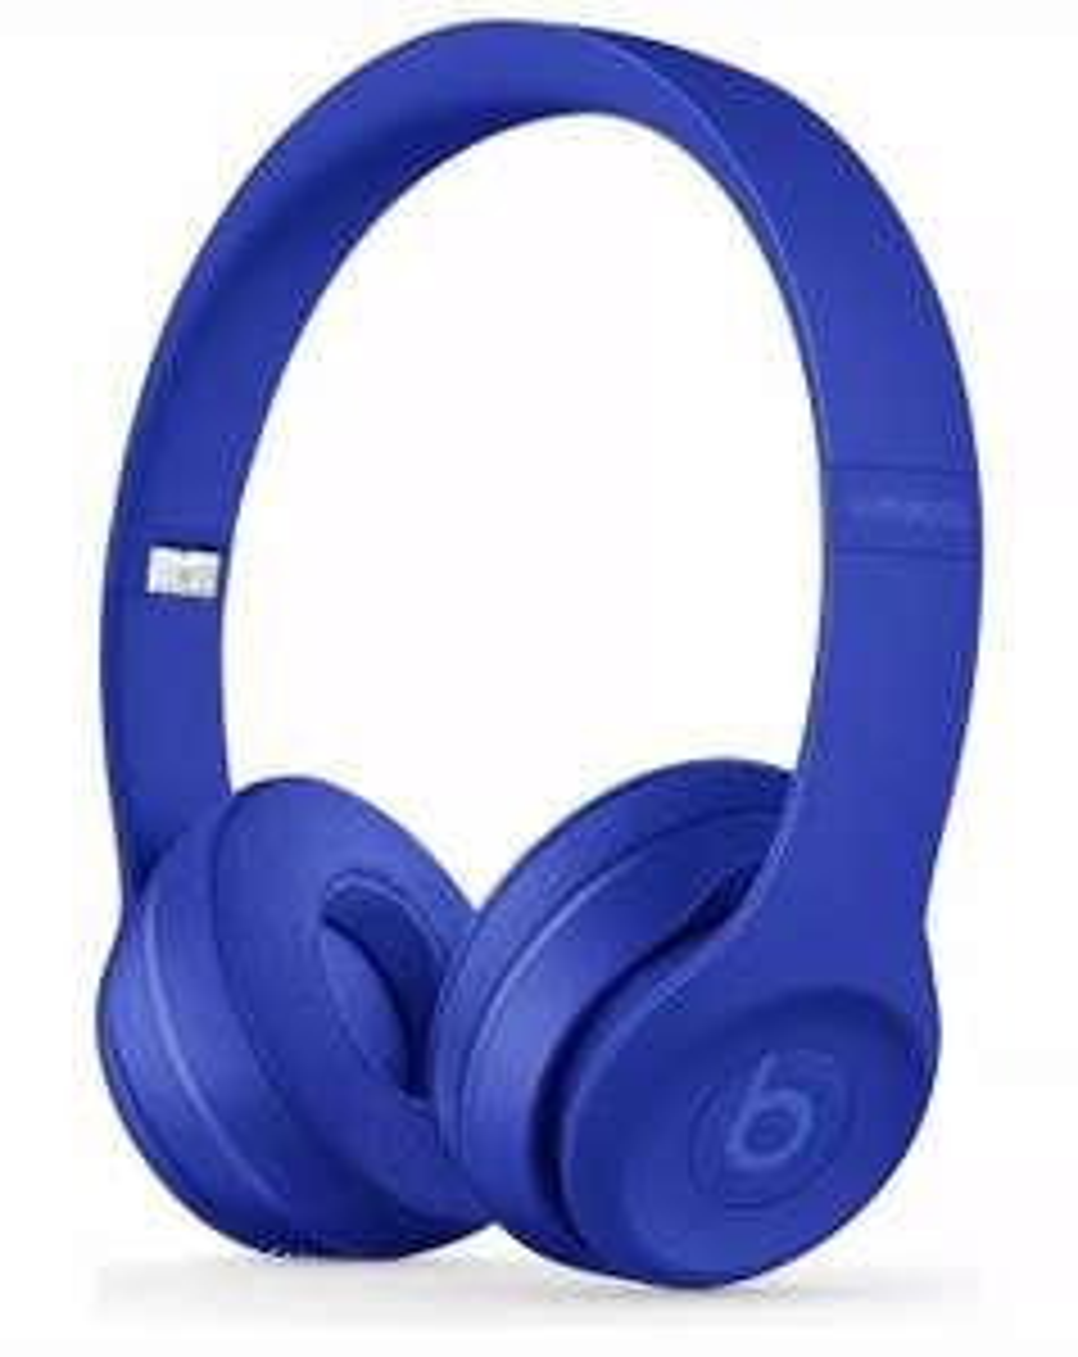 Argos ebay - Beats Solo 3 Wireless Heaphones - £84.99 delivered